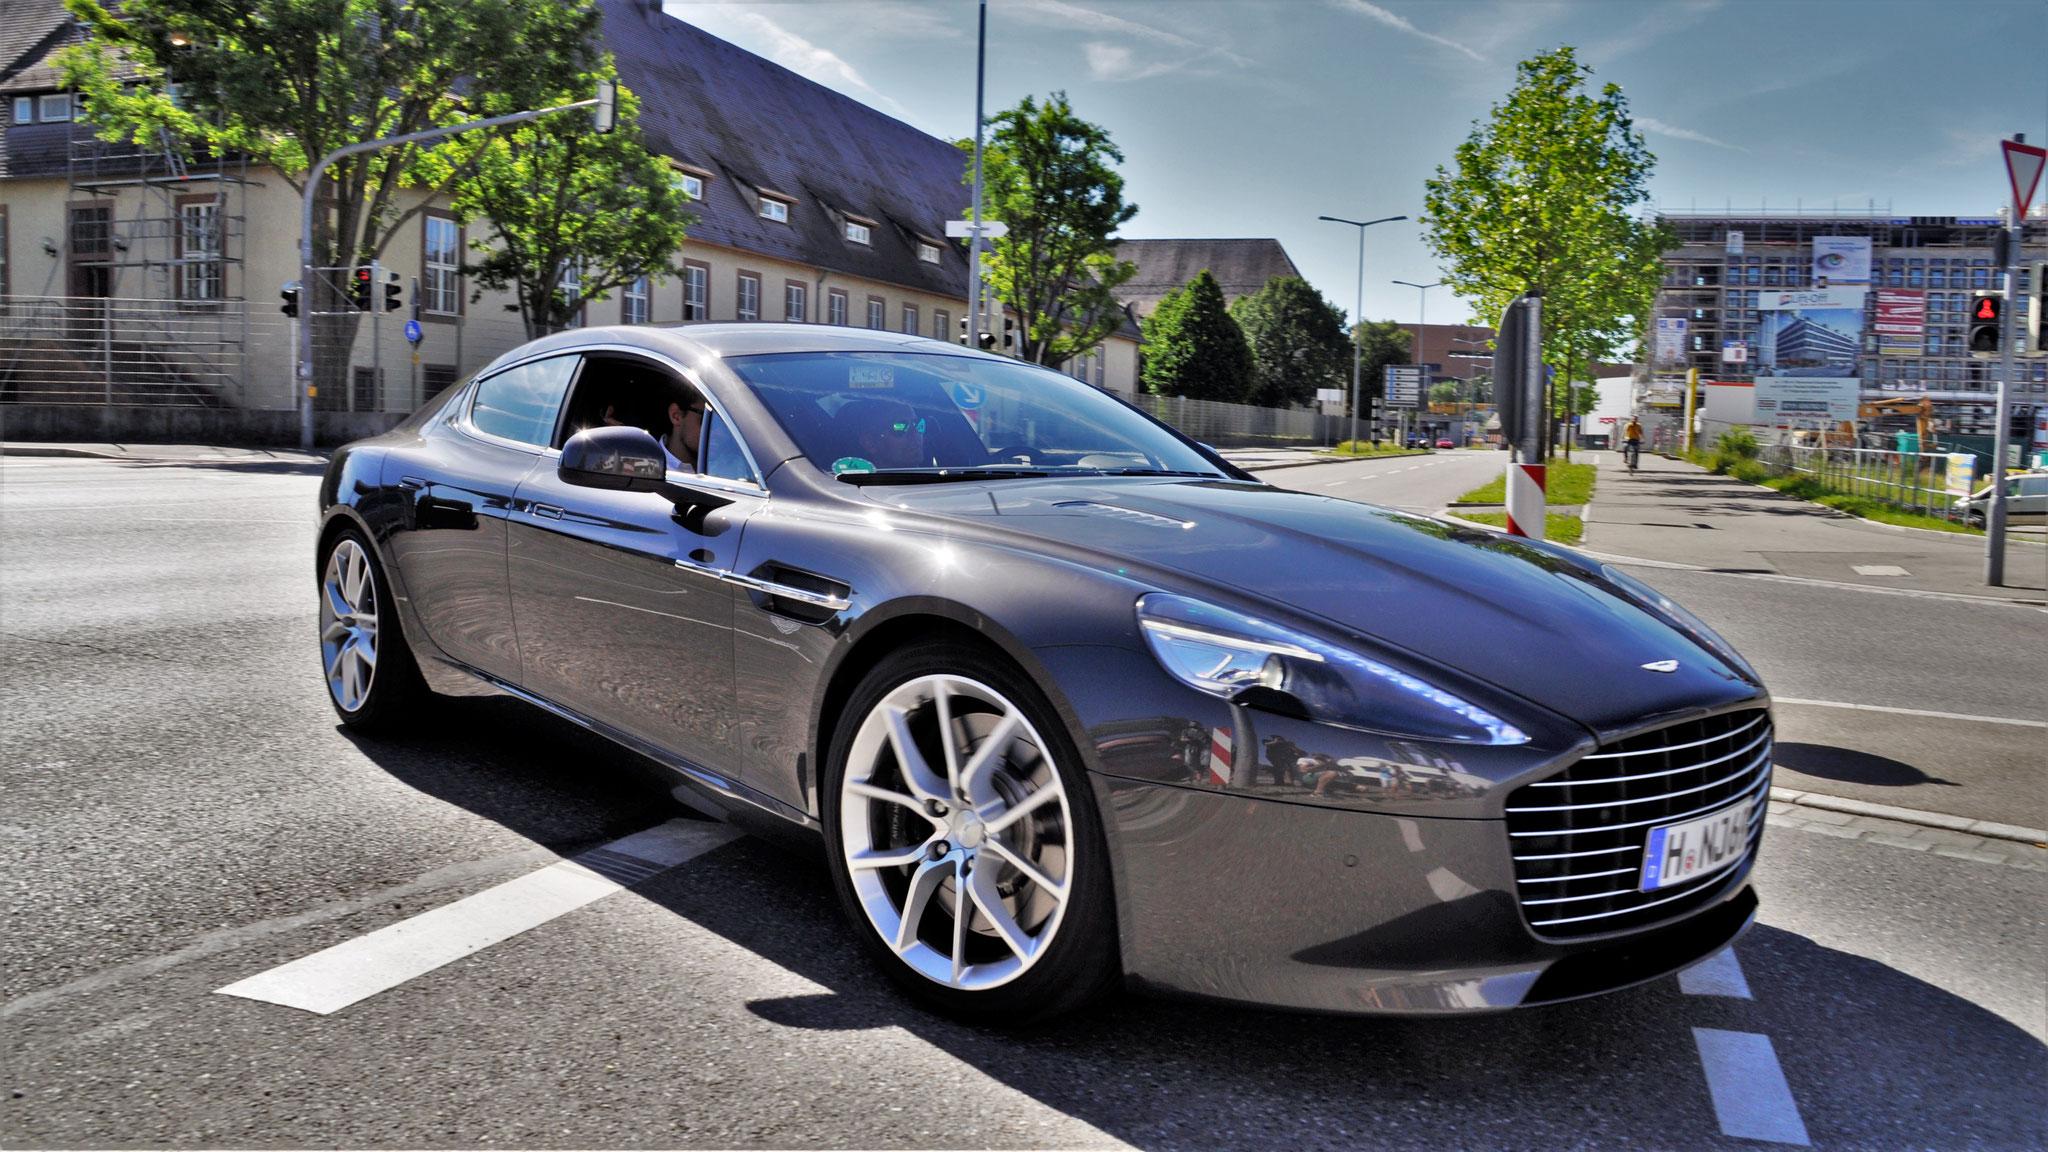 Aston Martin Rapide S - H-NJ-69